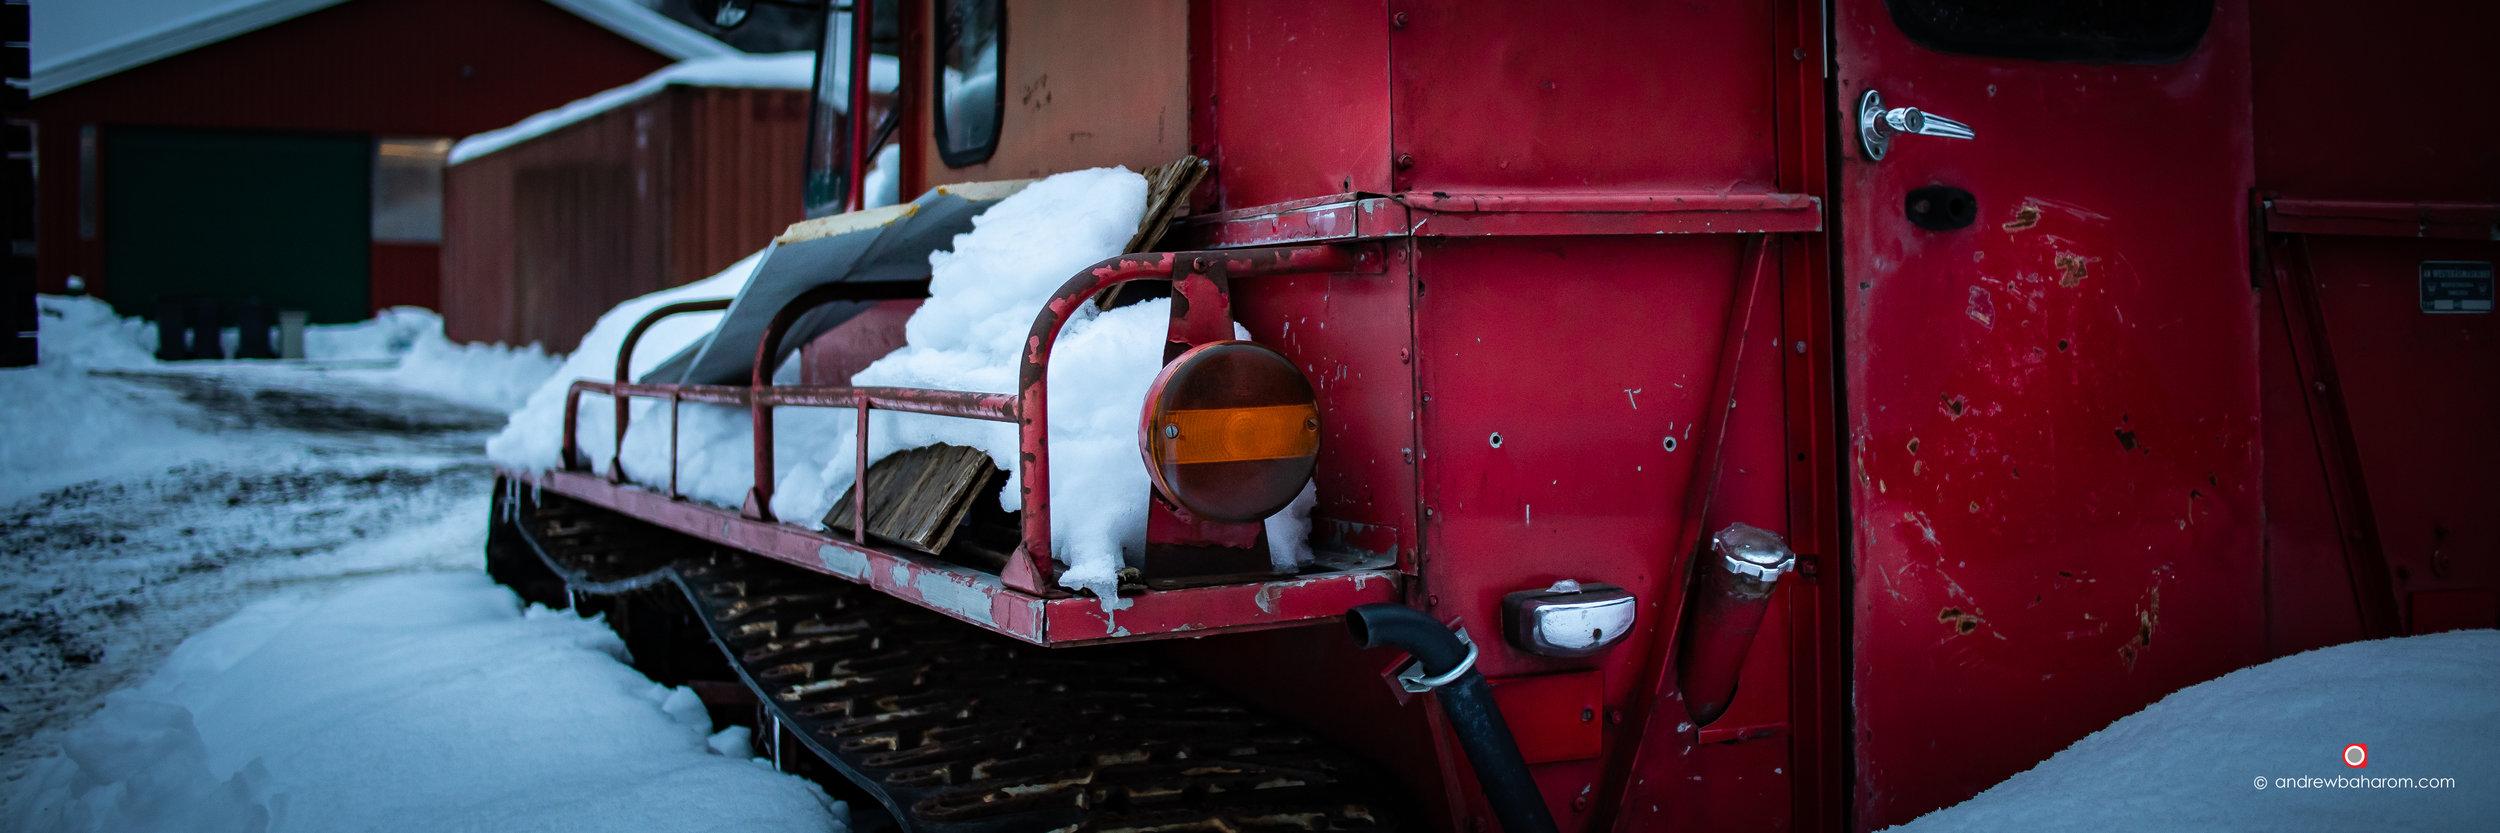 Red Snow Plough.jpg